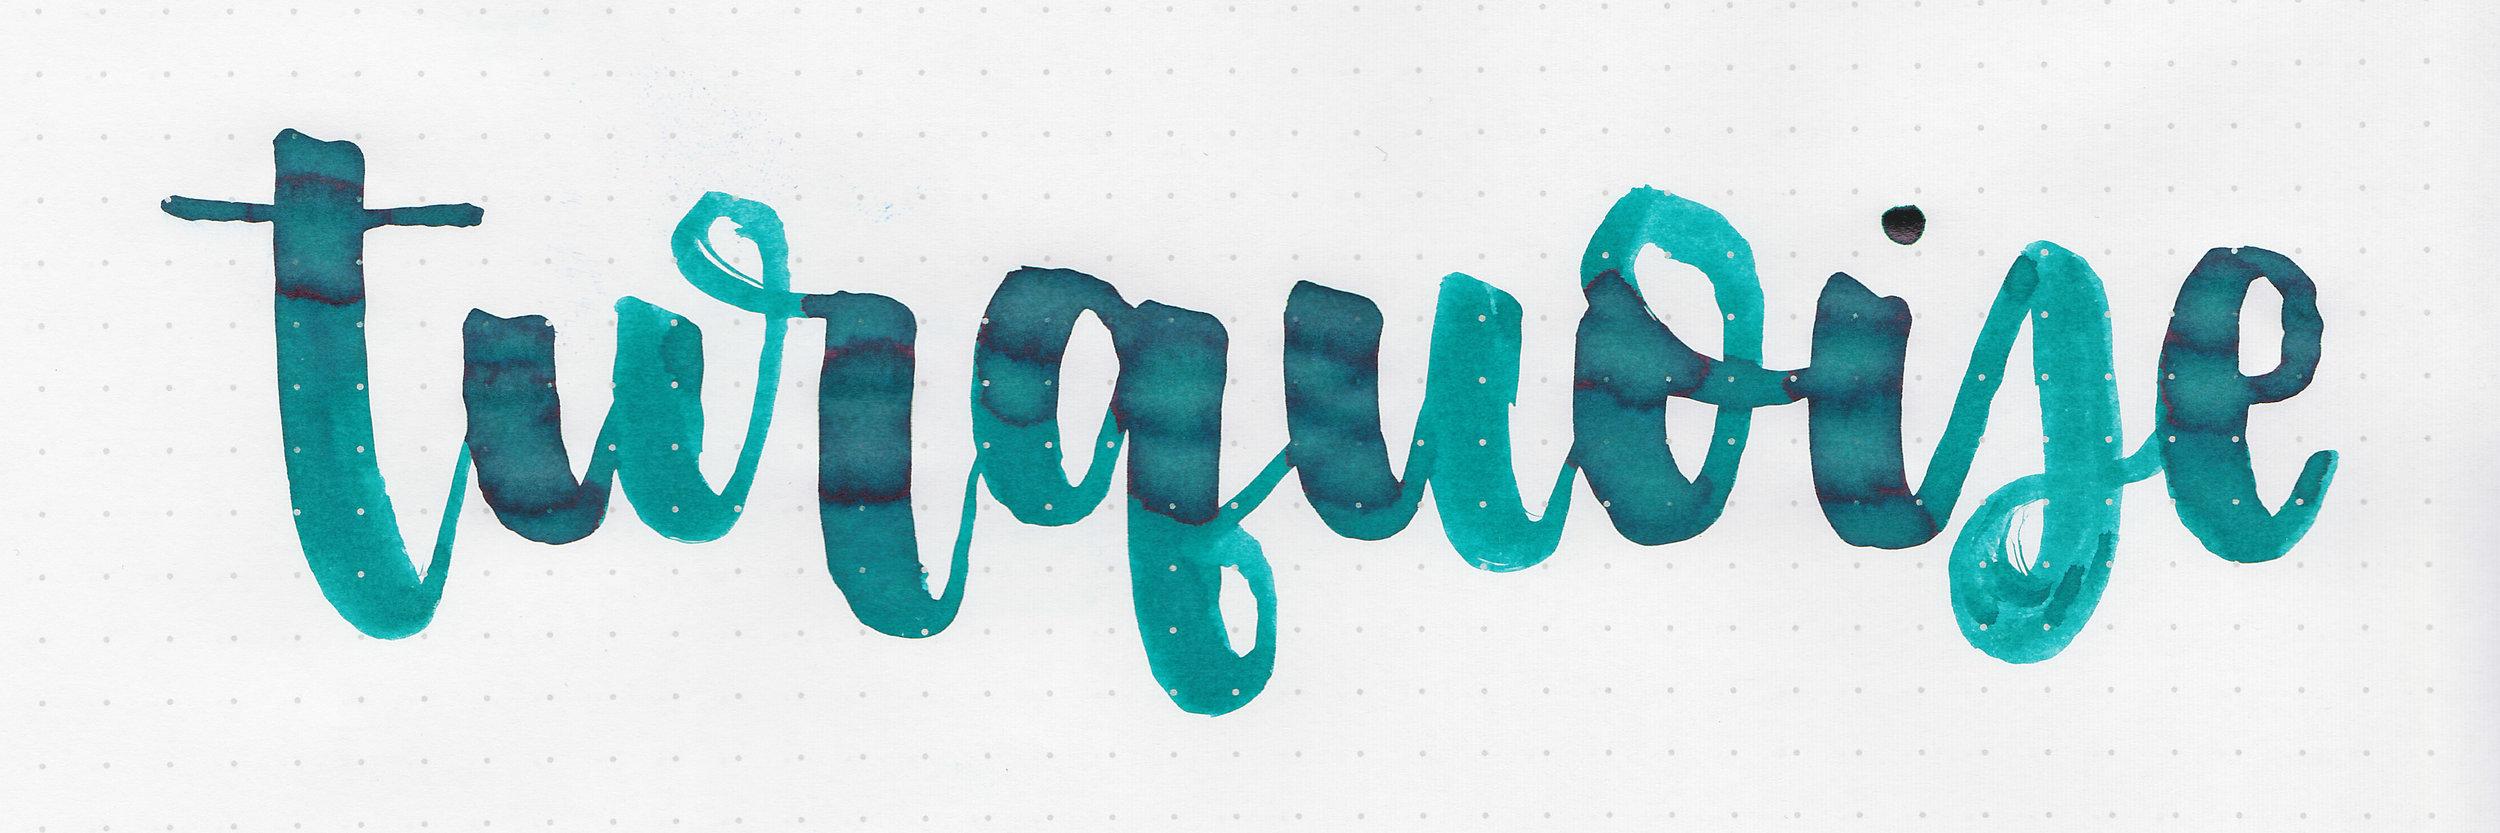 nood-turquoise-2.jpg